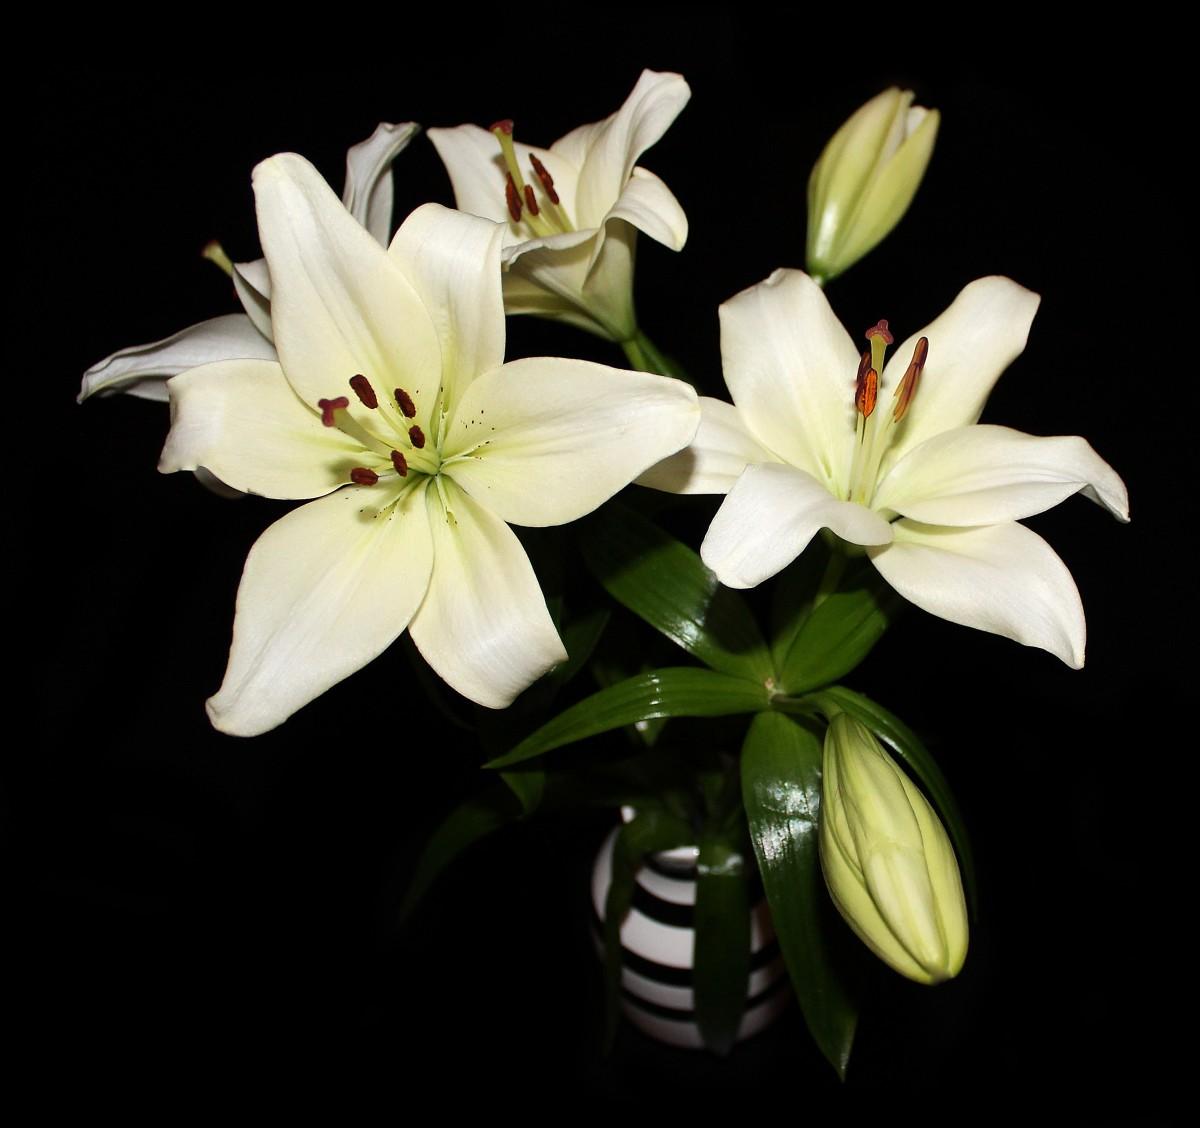 Free images white flower petal spring botany flora flowers blossom plant white flower petal bouquet izmirmasajfo